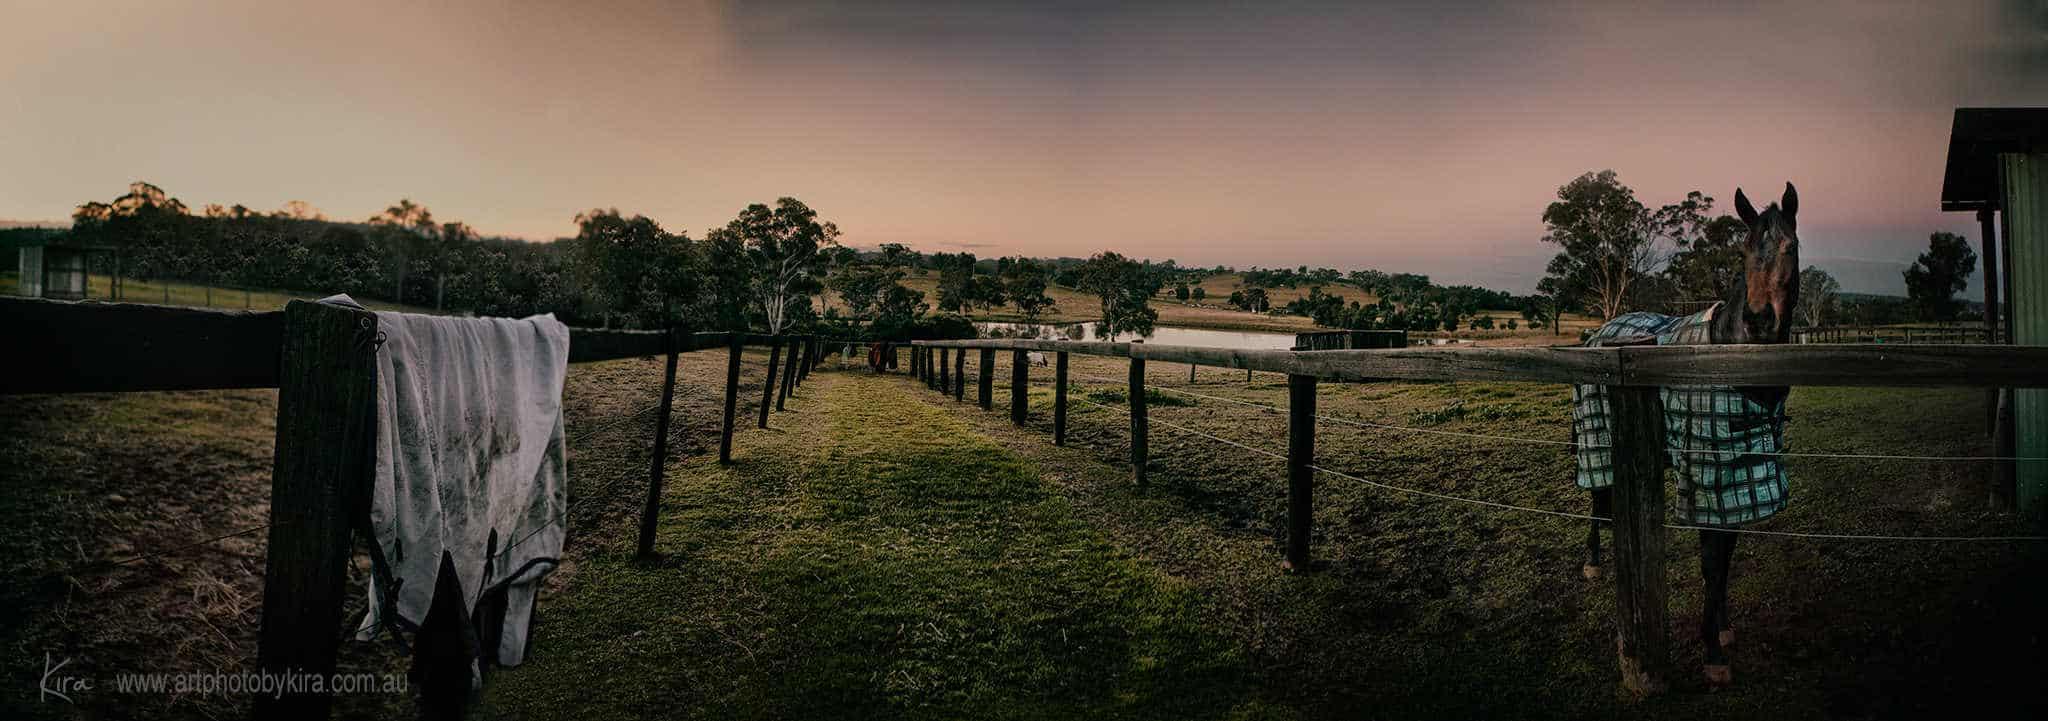 horse photography Sydney